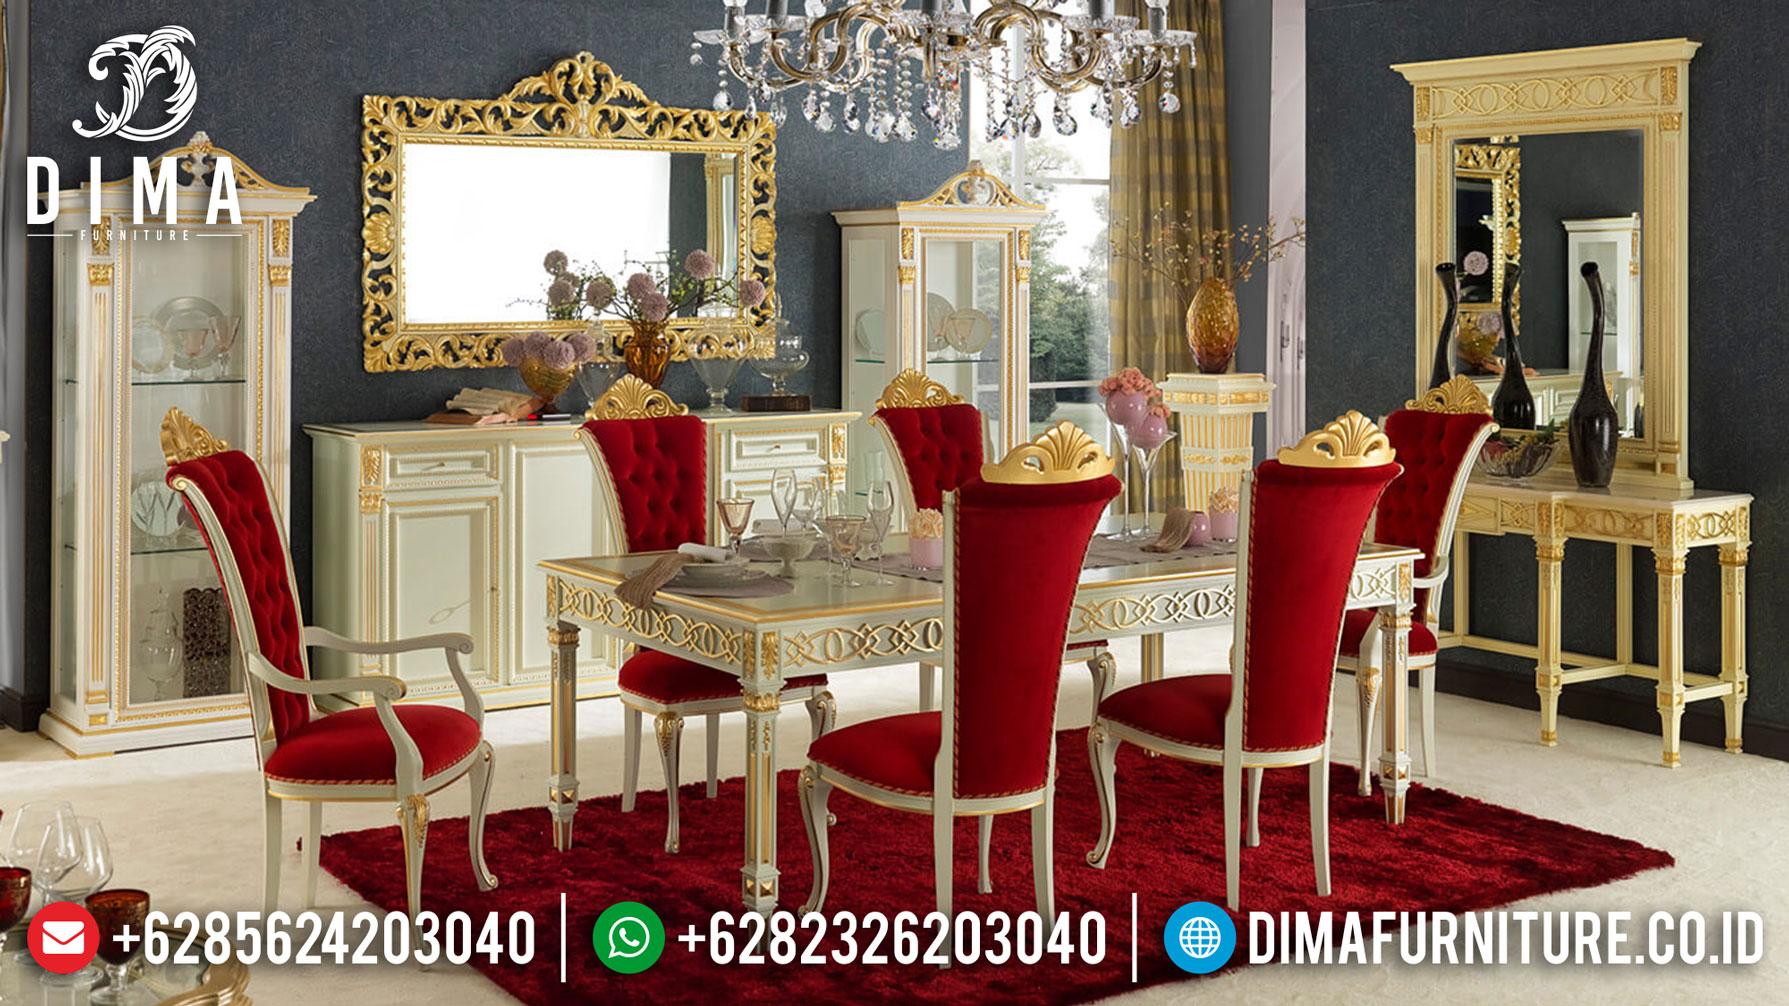 Model Meja Makan Mewah Ukiran Luxury Royals Red Velvet Soft Fabric ST-1032